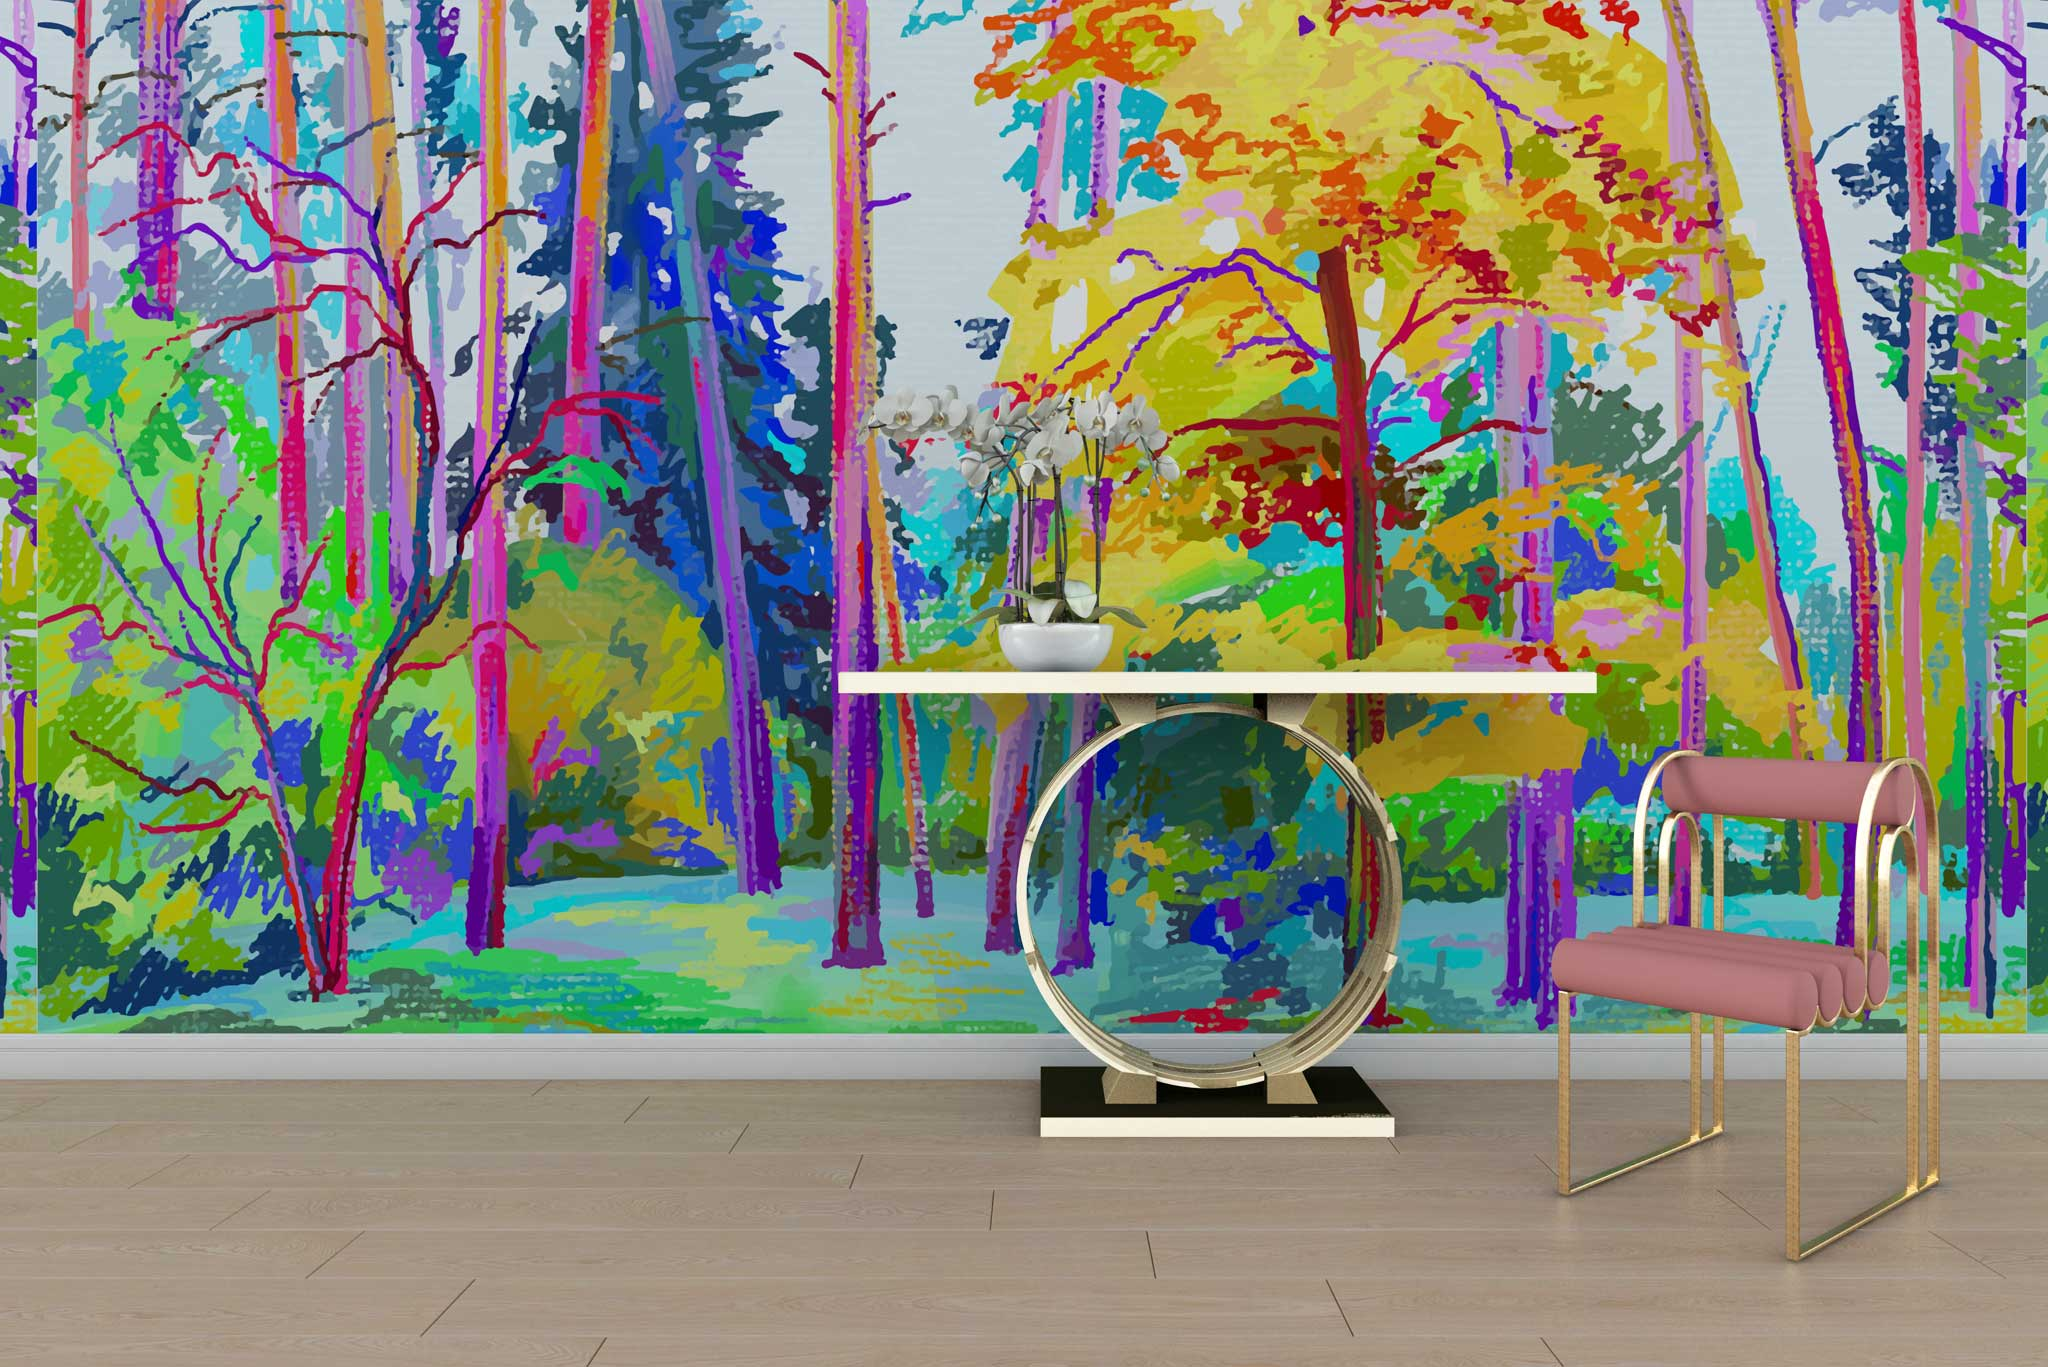 tapet-fototapet-special-personalizat-customizabil-comanda-bucuresti-daring-prints-model-desen-pictura-padure-colorata-multicolor